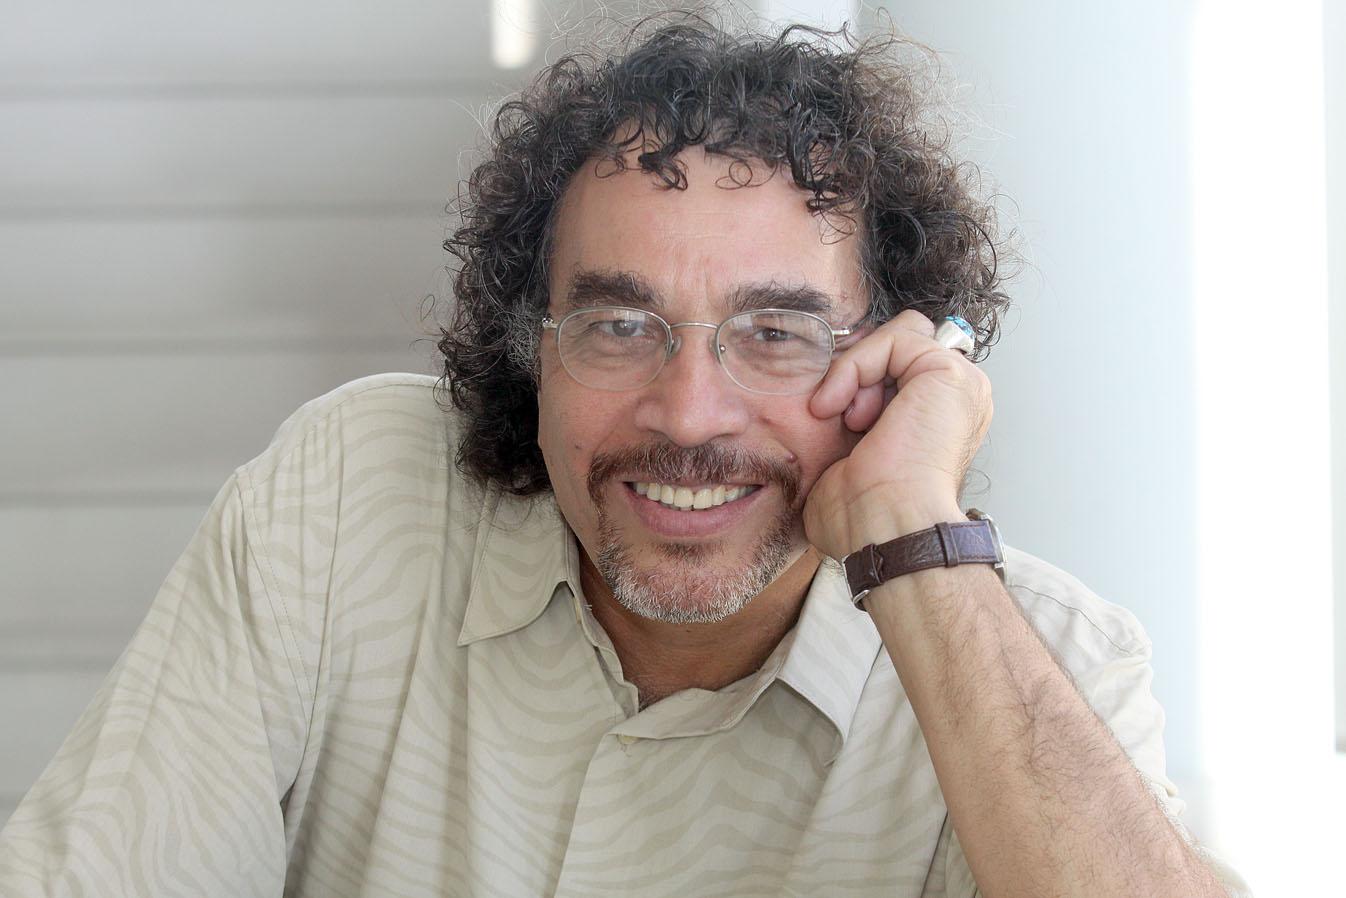 Mahmood Karimi-Hakak